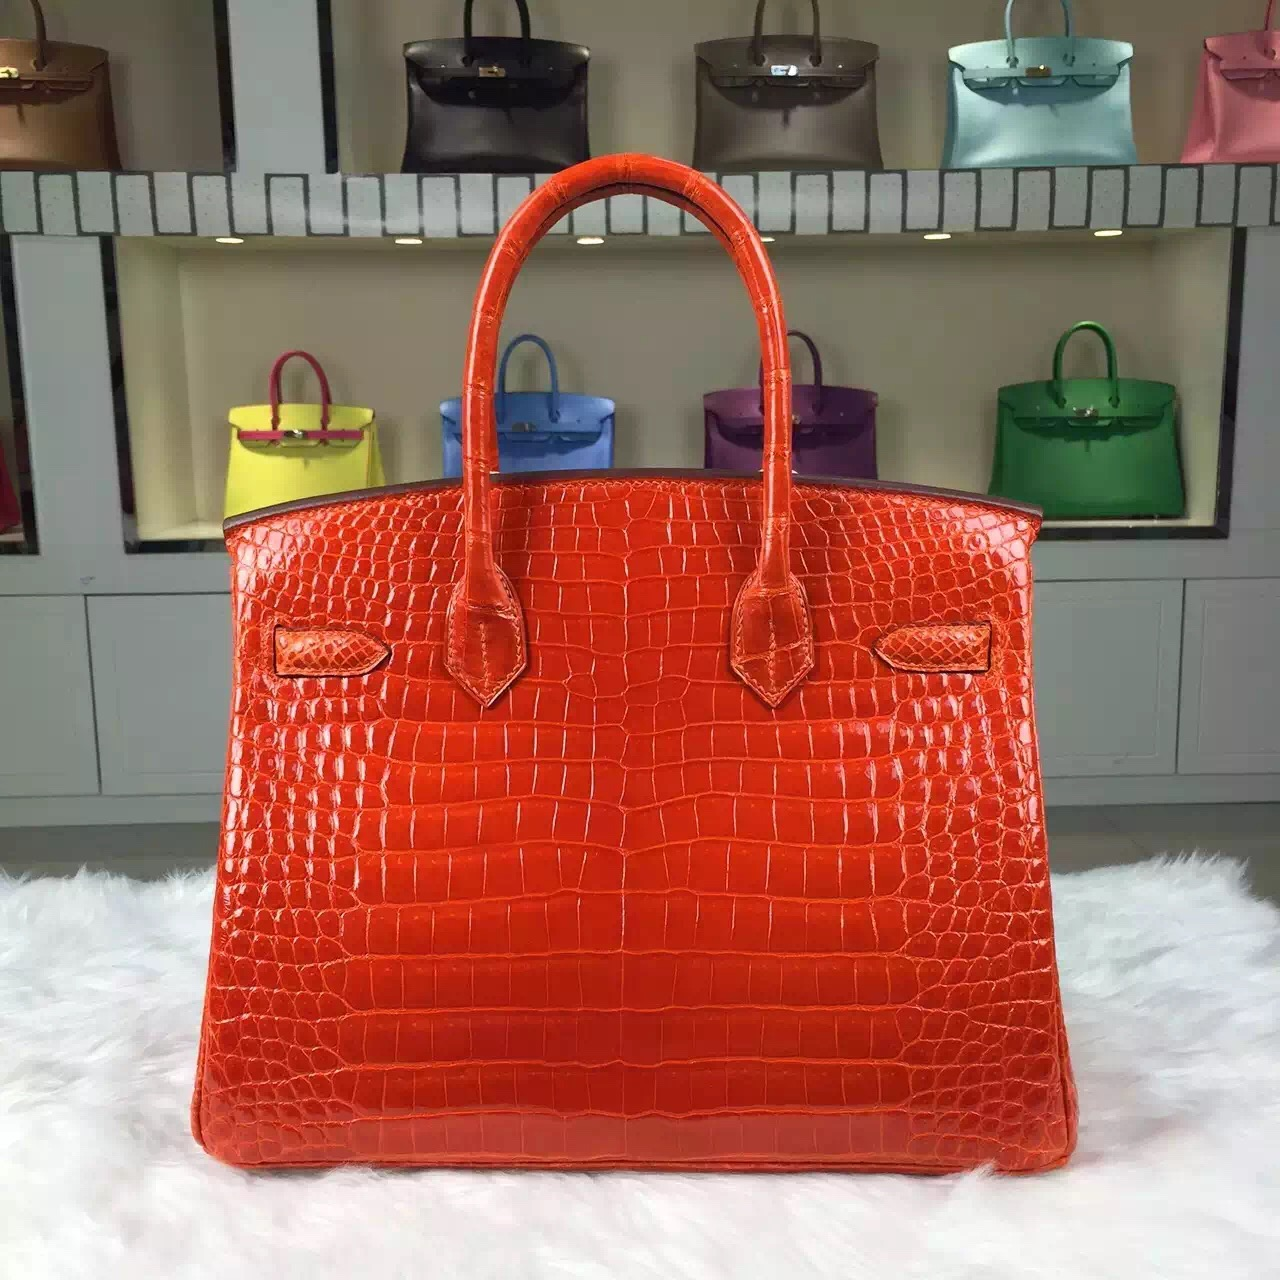 Hermes Custom-made Birkin 30CM Original Crocodile Shiny Leather Tote Bag in Orange